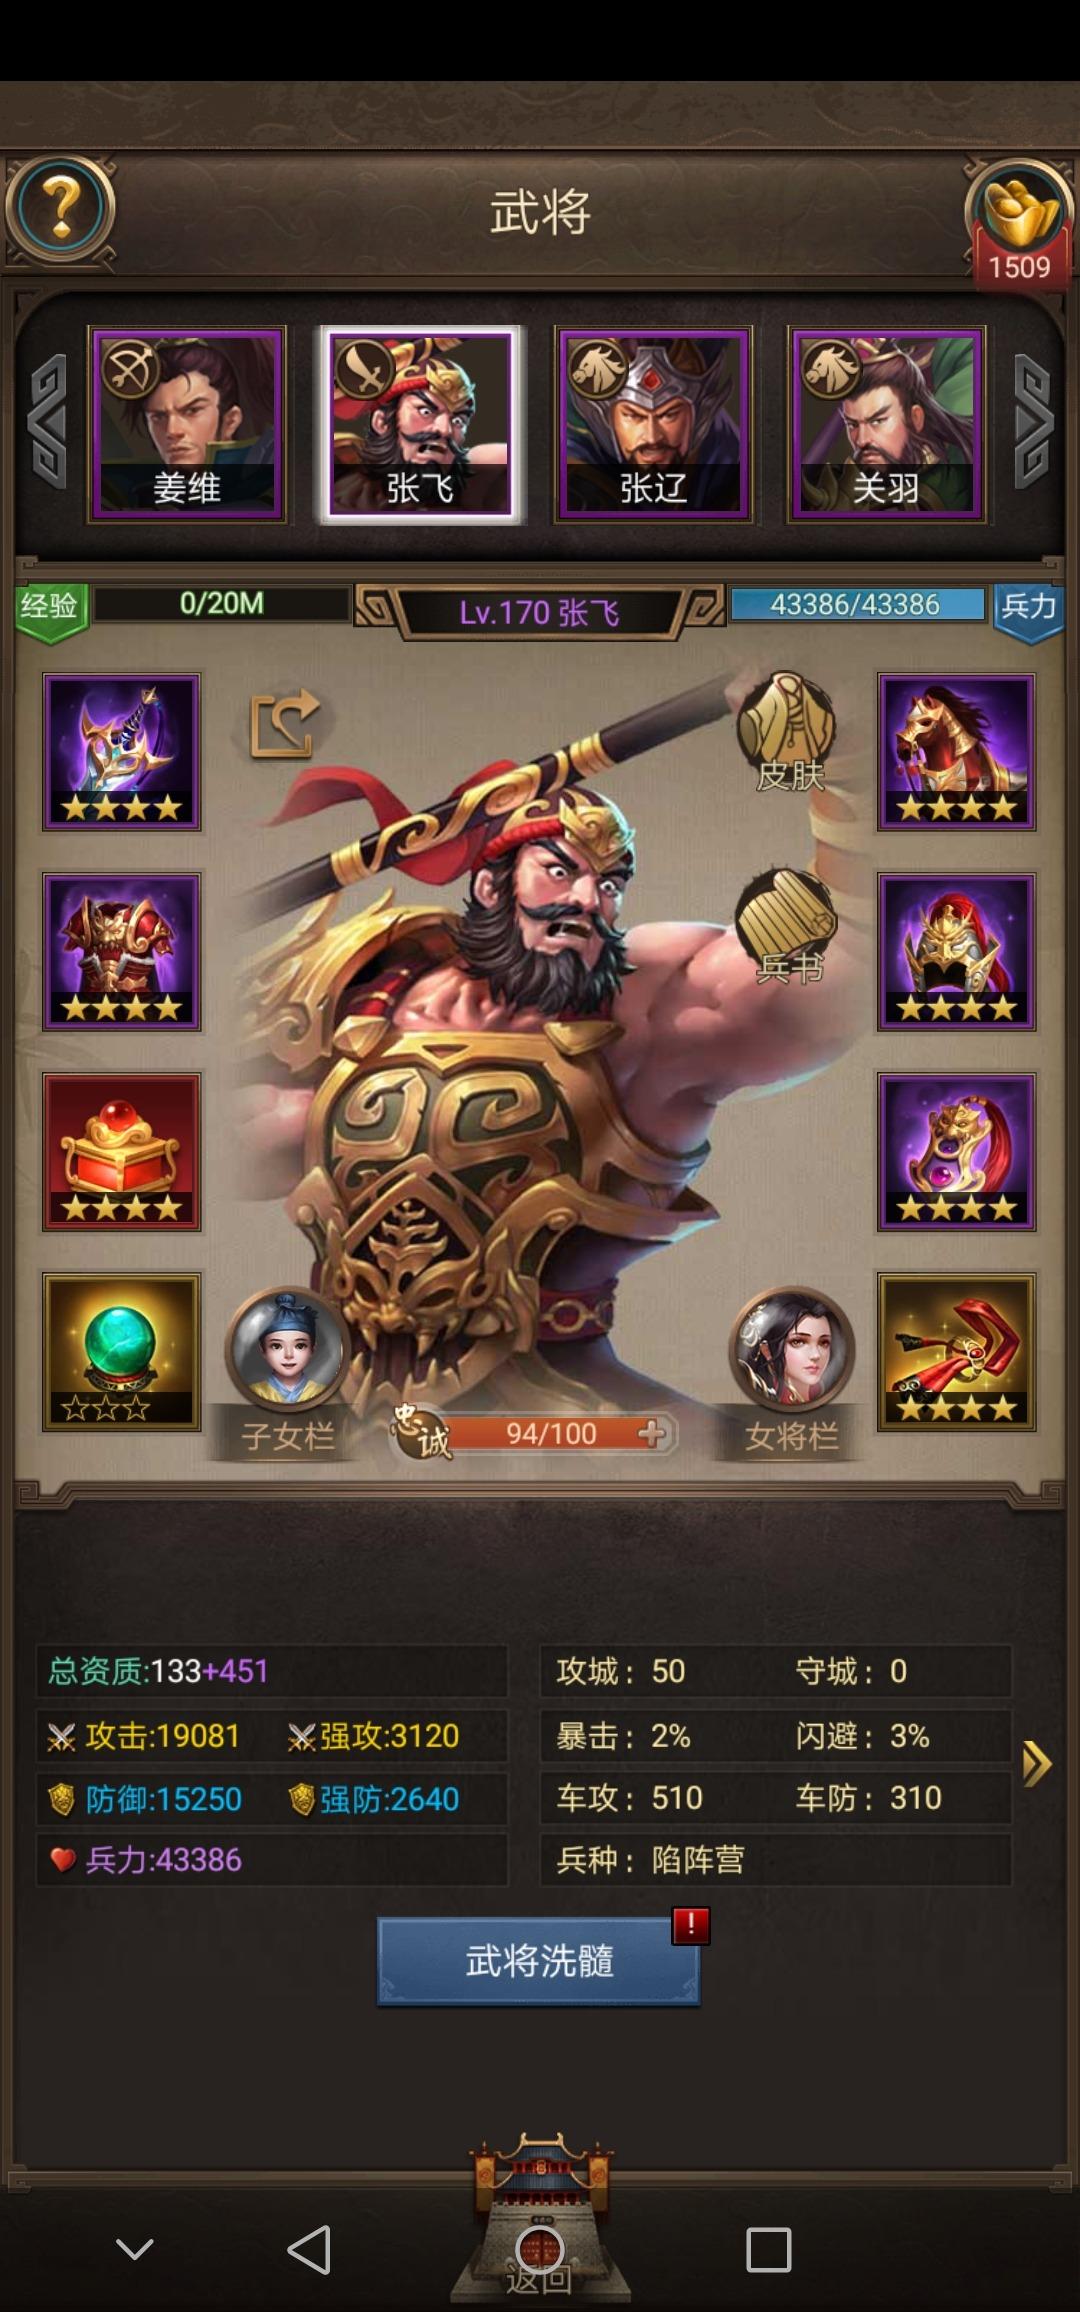 Screenshot_20190605_065624_com.tencent.tmgp.ztsg.tiandimeng.jpg